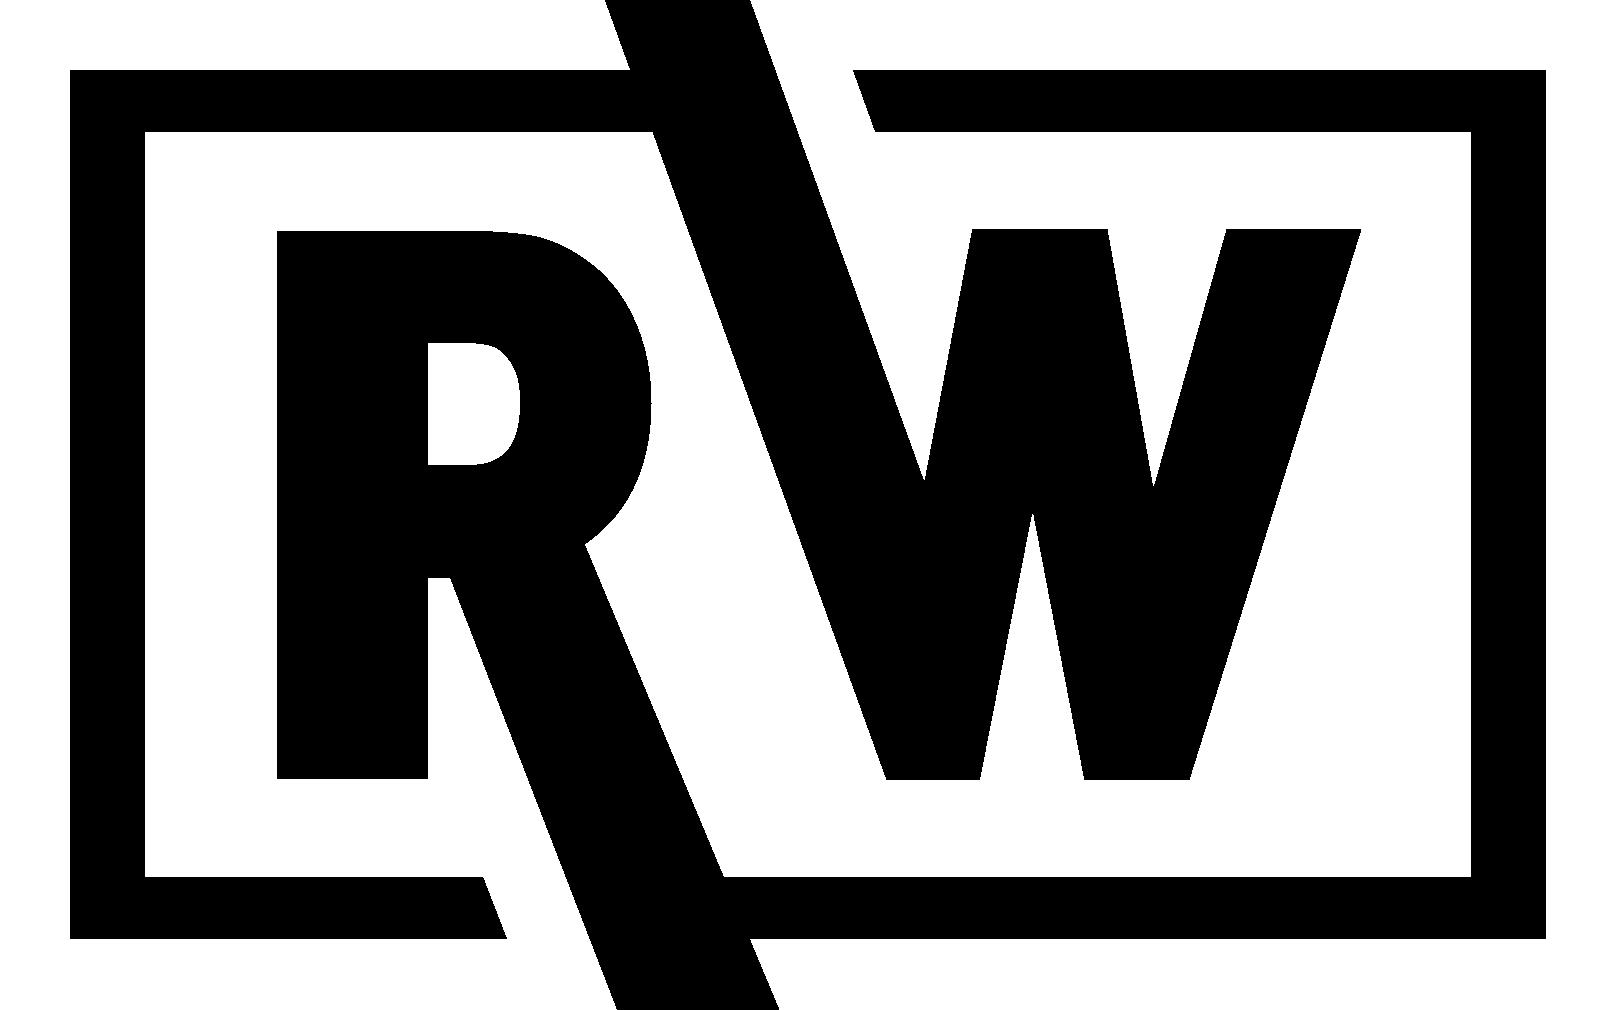 riskwell logo all white